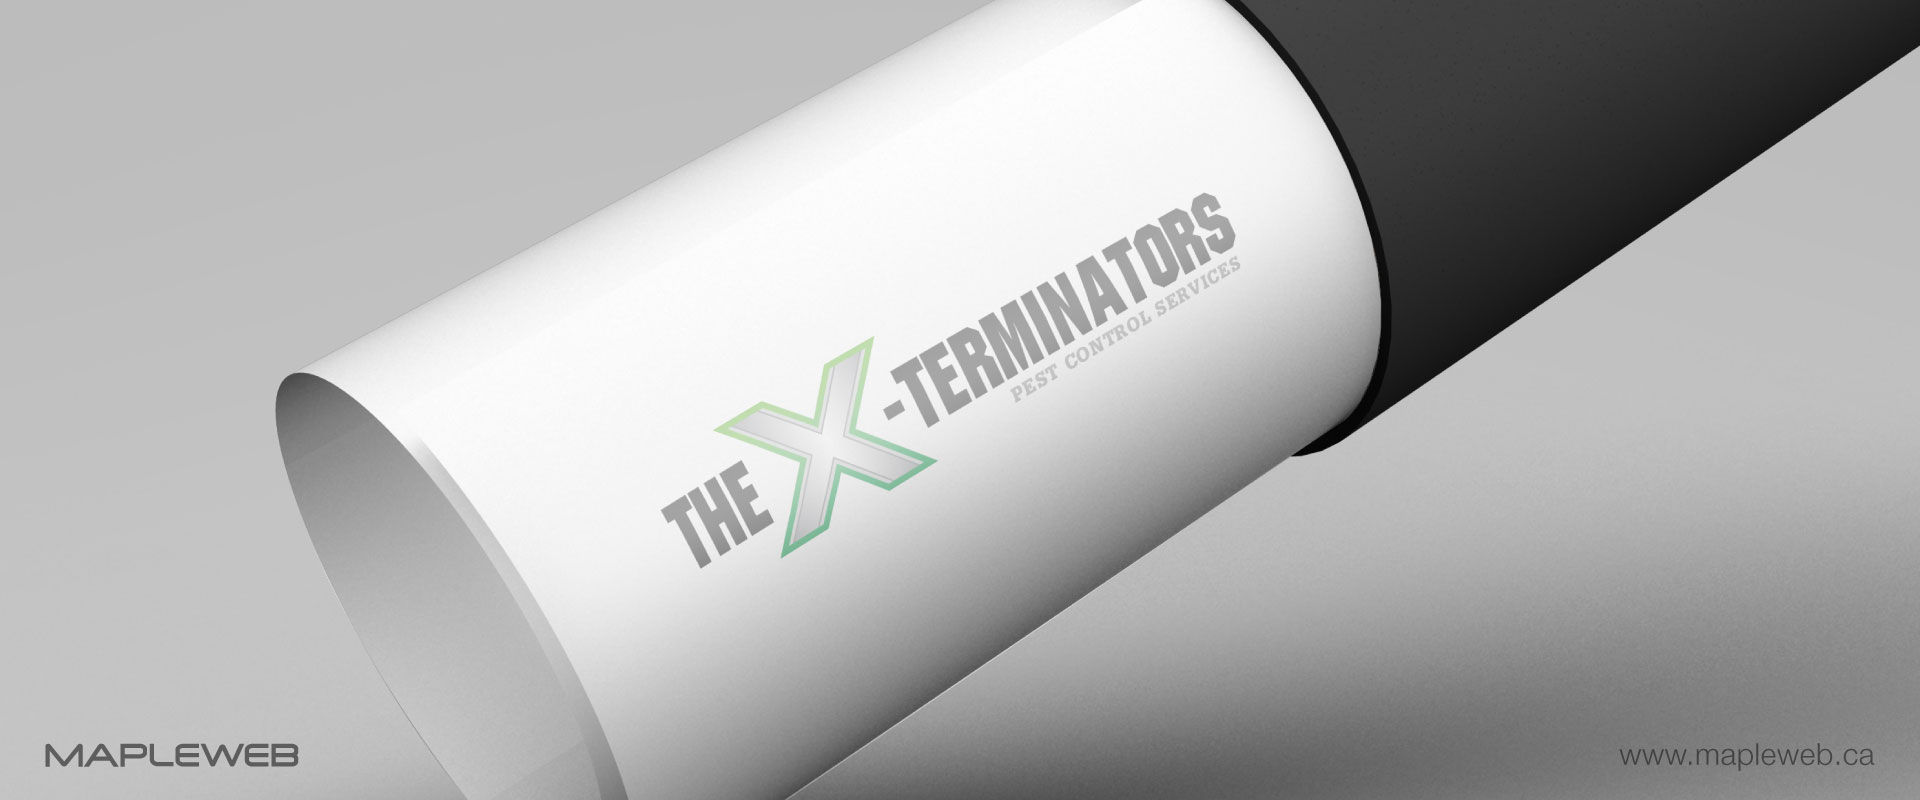 the-x-terminators-brand-logo-design-by-mapleweb-vancouver-canada-folded-paper-mock